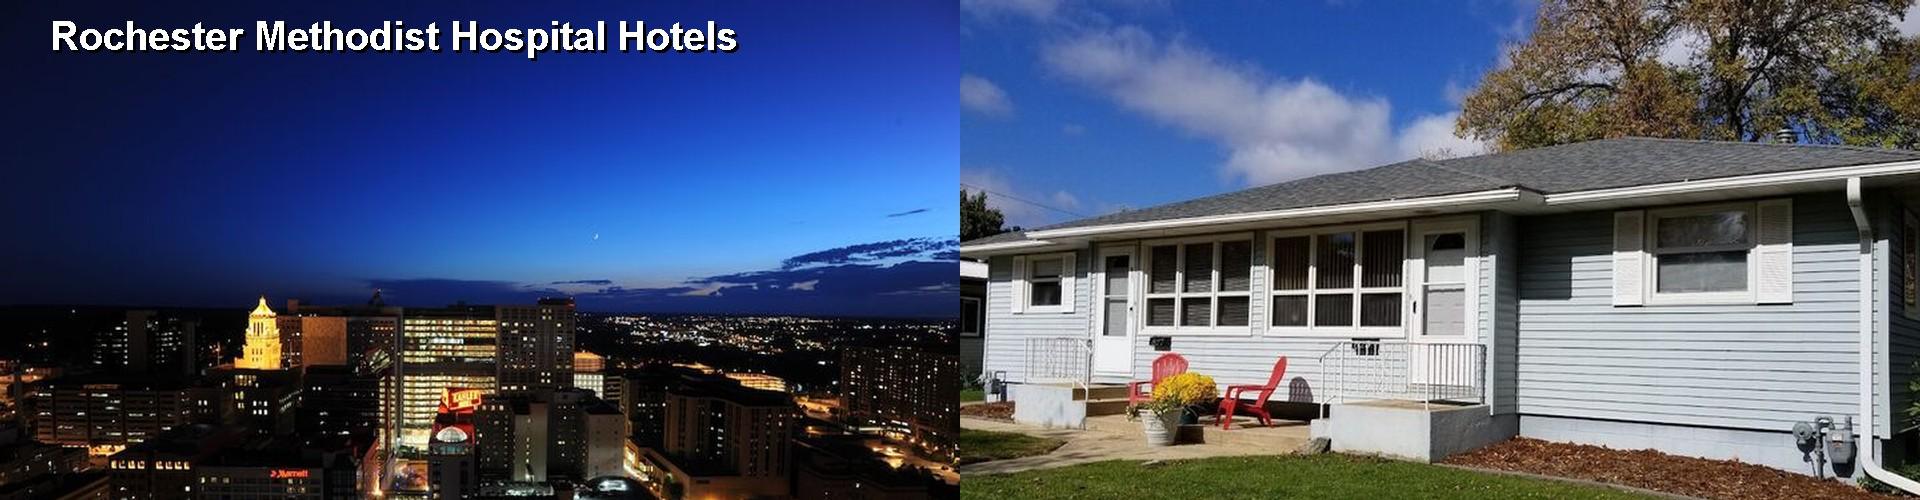 5 Best Hotels Near Rochester Methodist Hospital